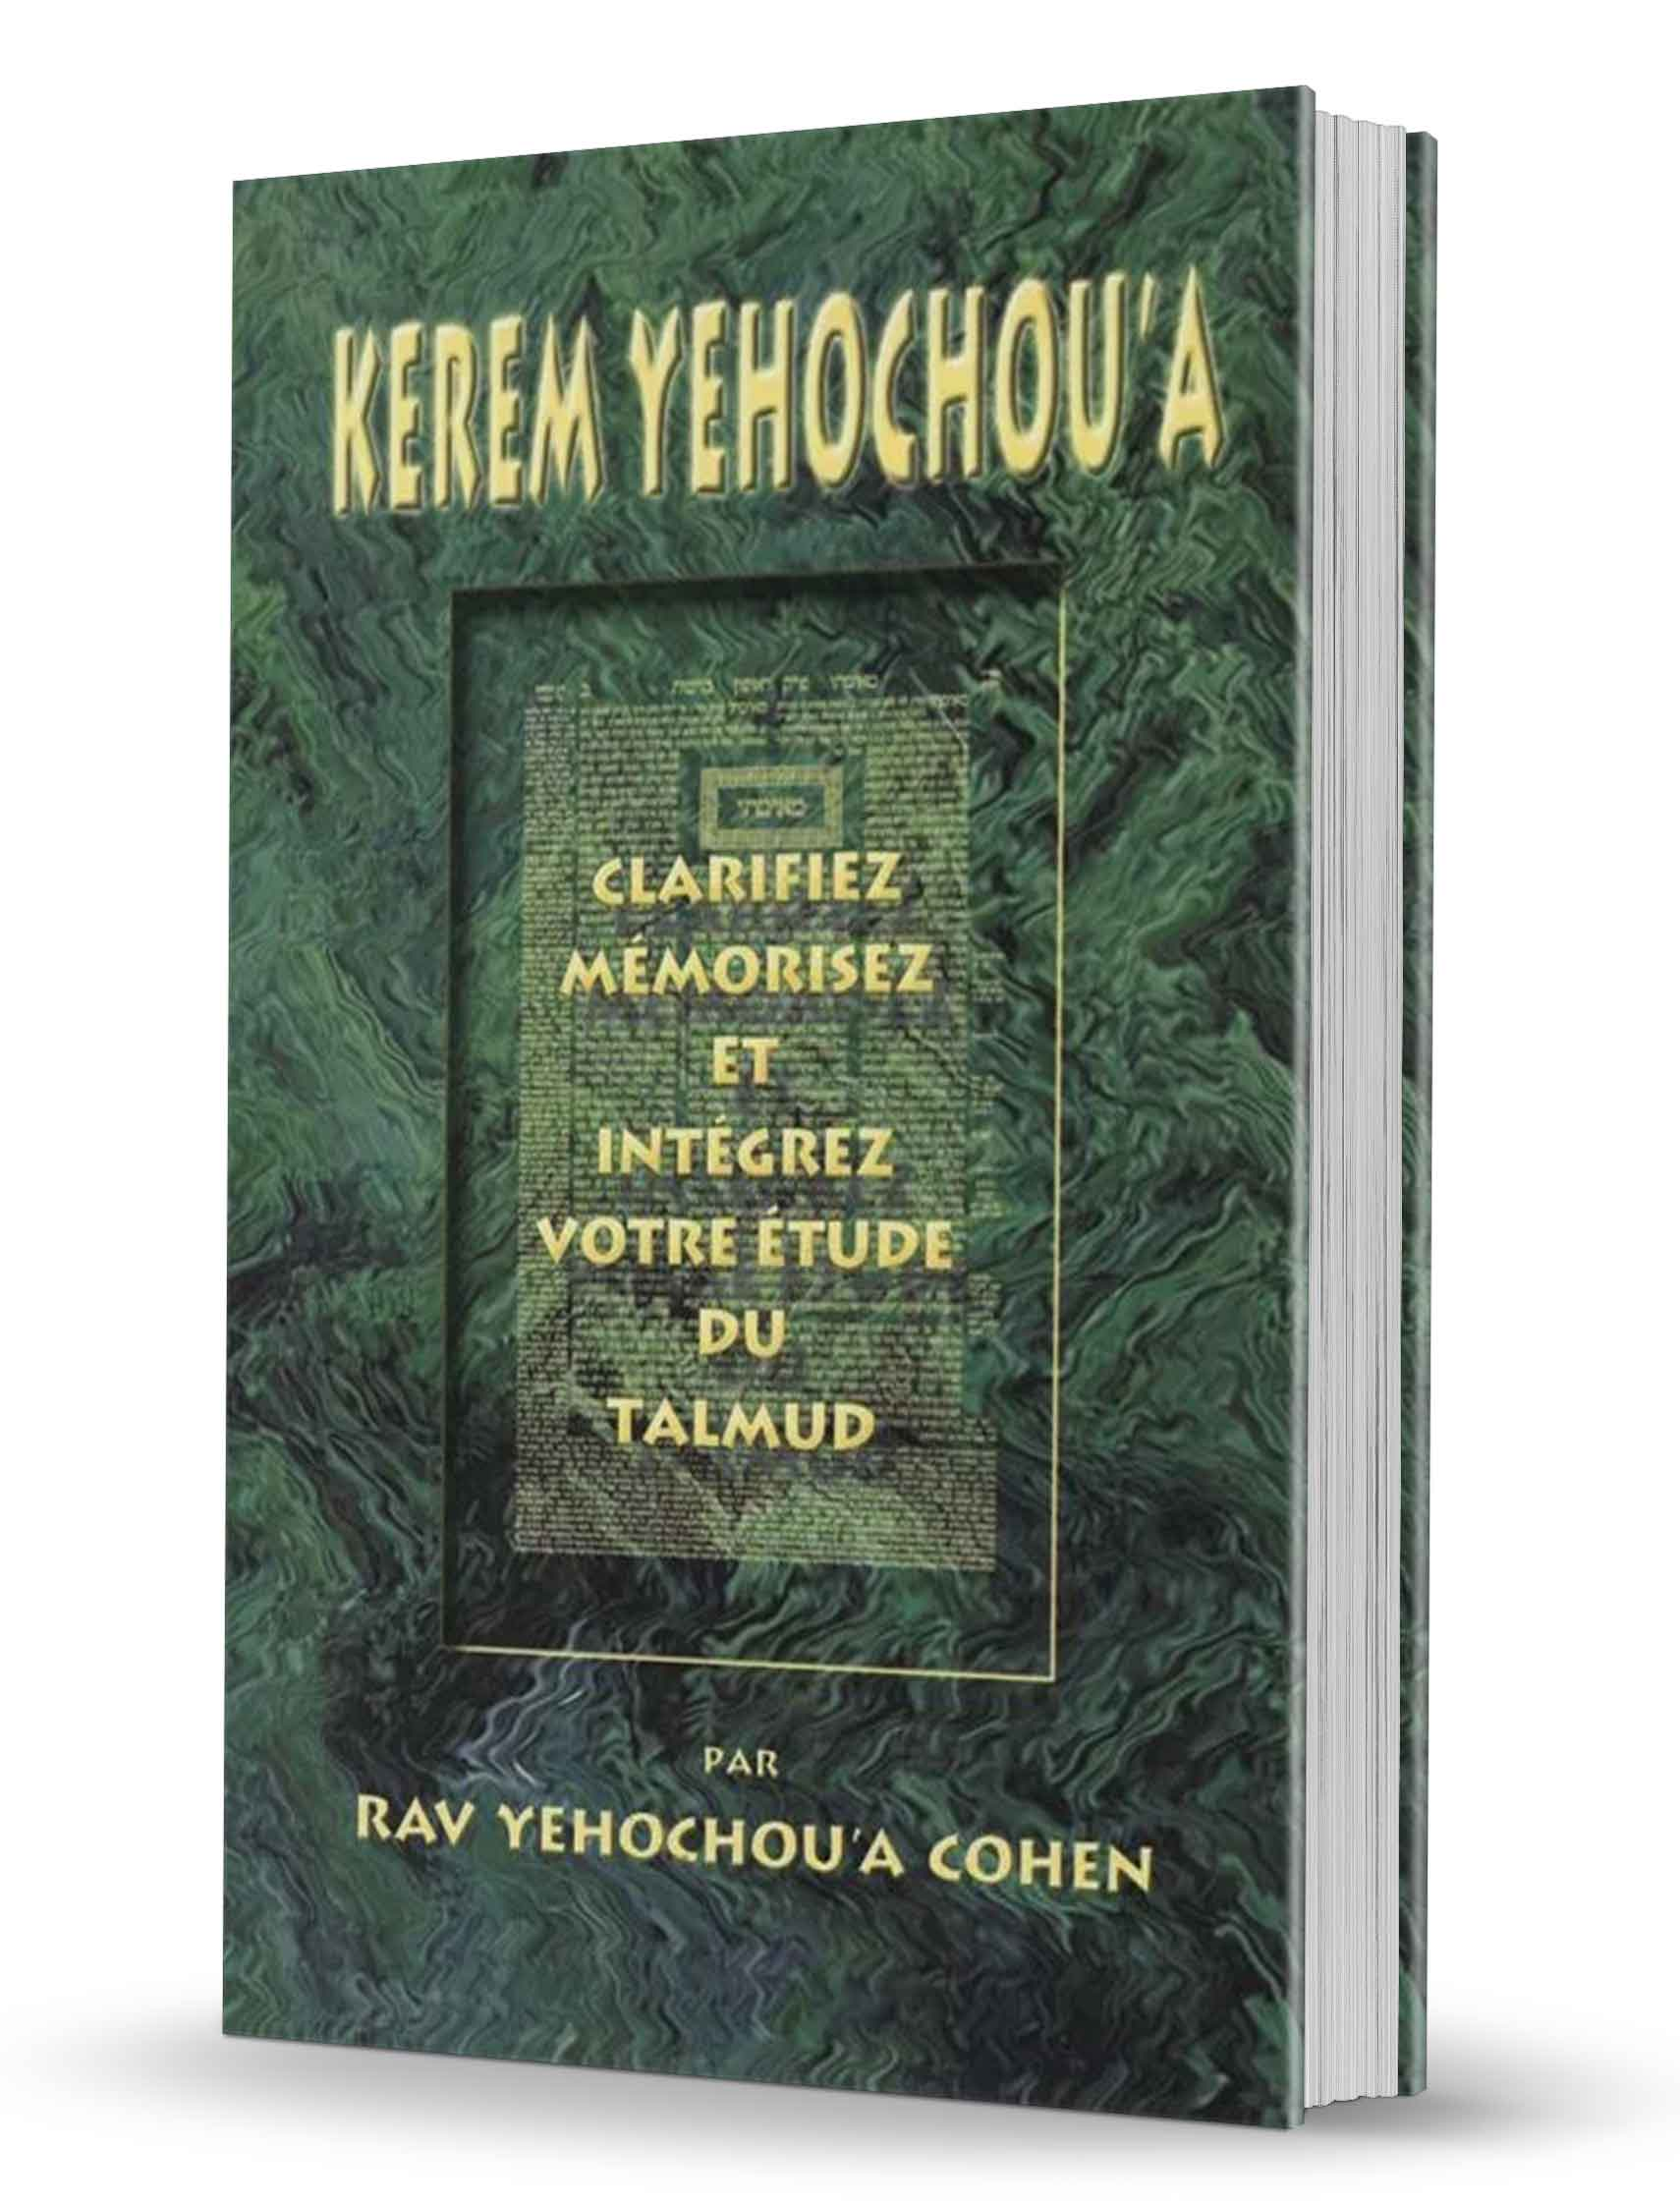 Kerem Yehochoua